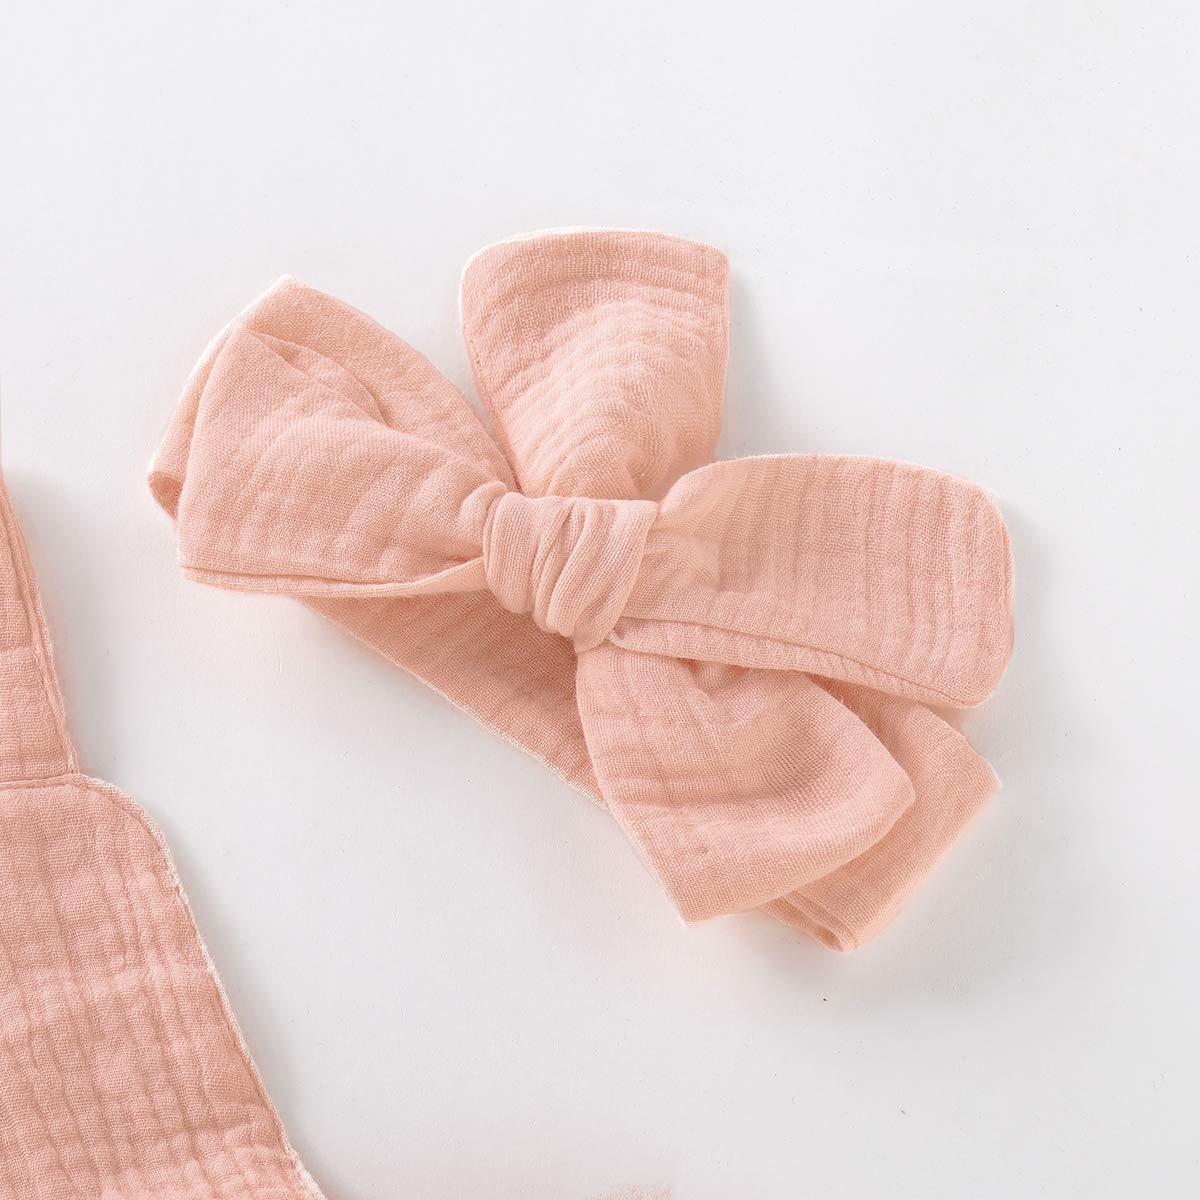 BabiBeauty Twins Baby Girls Sleeveless Romper Infant Girls Ruffles Jumpsuit Onesies with Headband